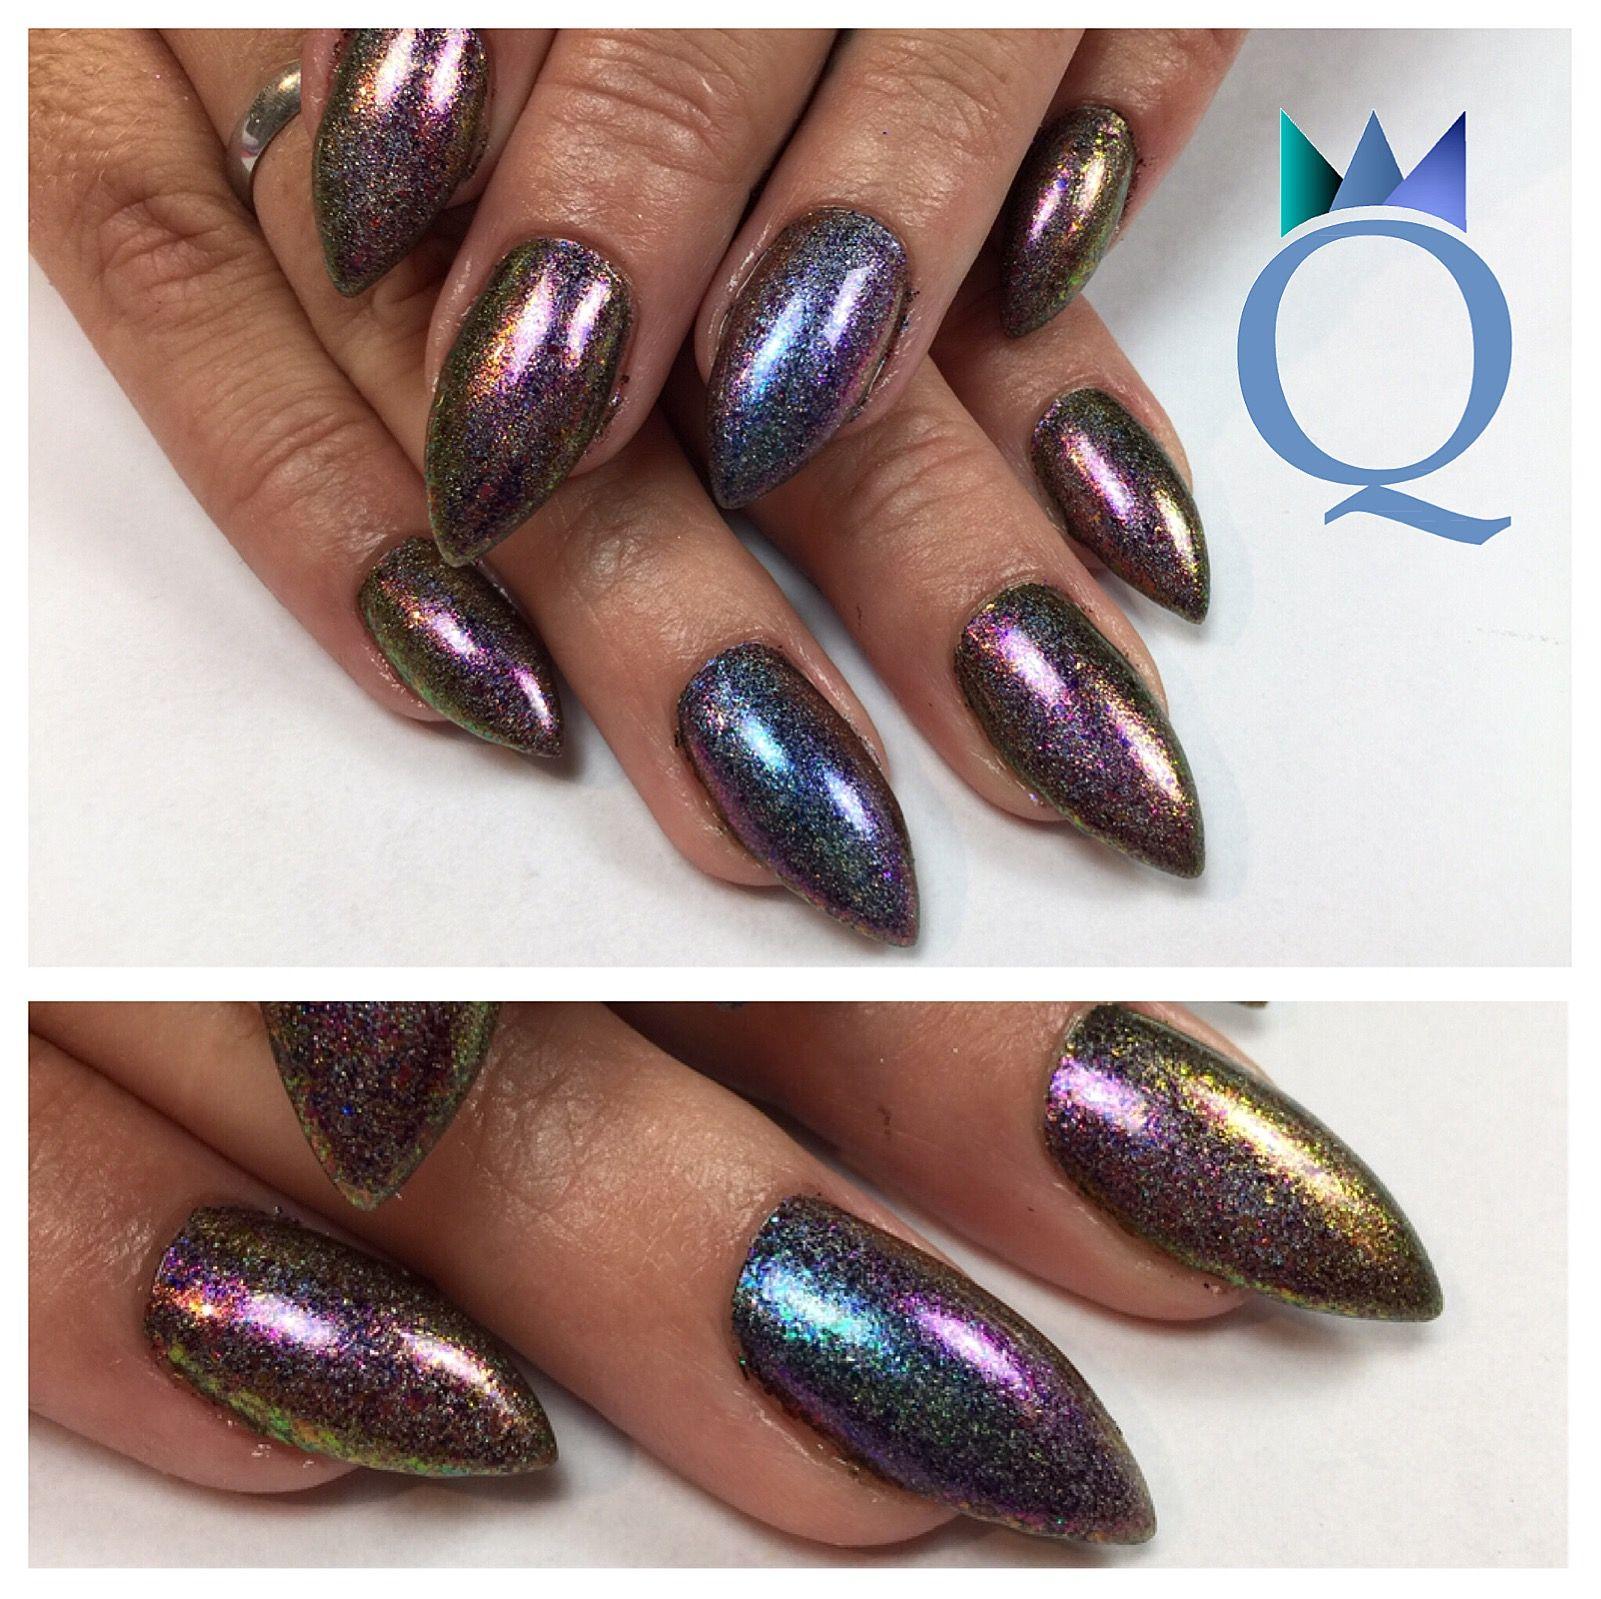 stilettonails #gelnails #nails #holopigment #stilettos #gelnägel ...